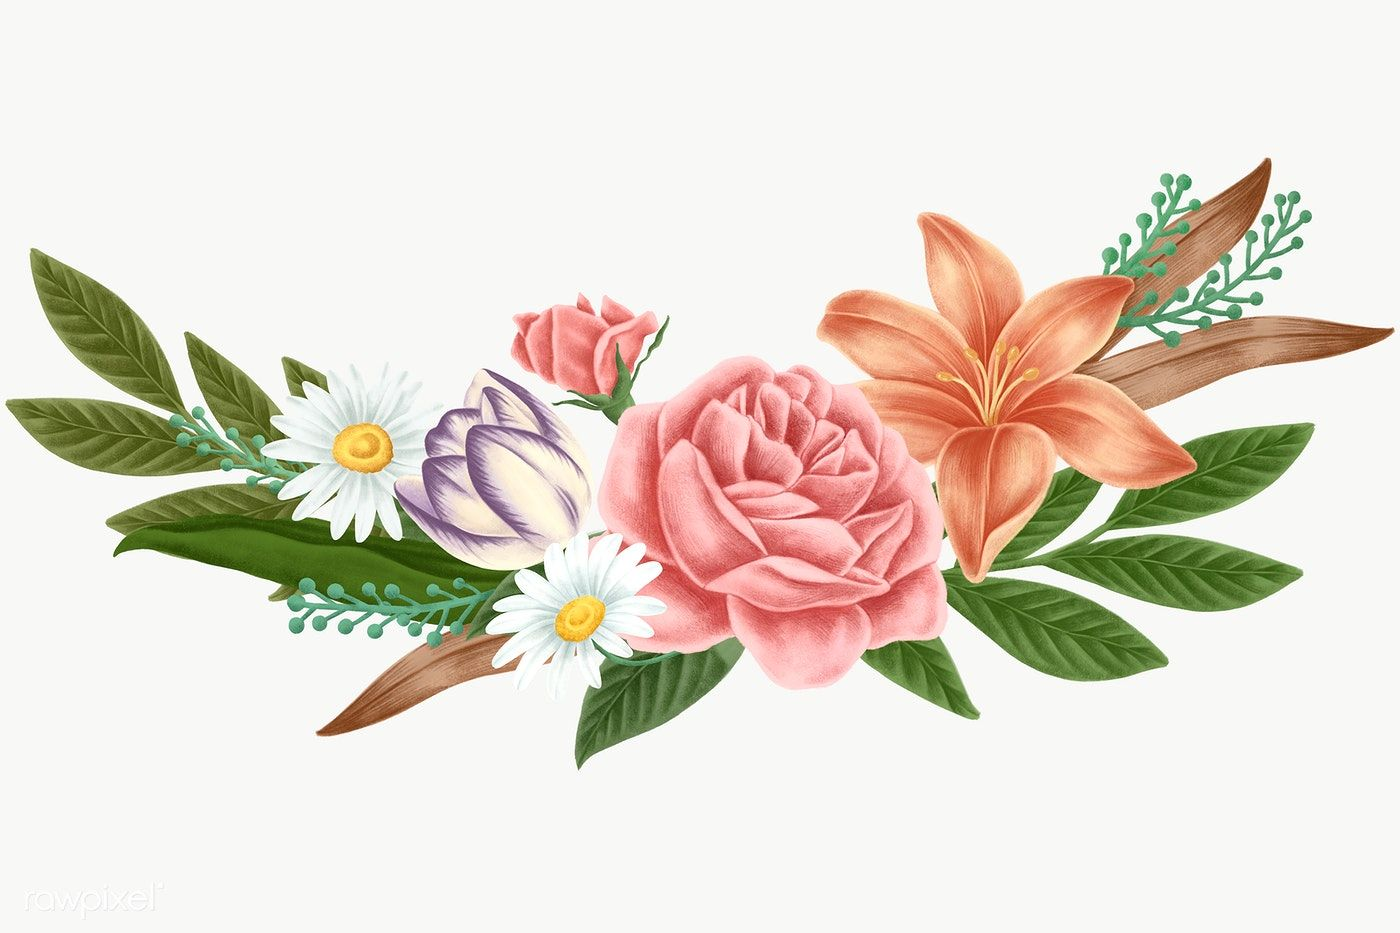 Vintage Flower Bunch Transparent Png Premium Image By Rawpixel Com Noon Flower Illustration Bunch Of Flowers Vintage Flowers